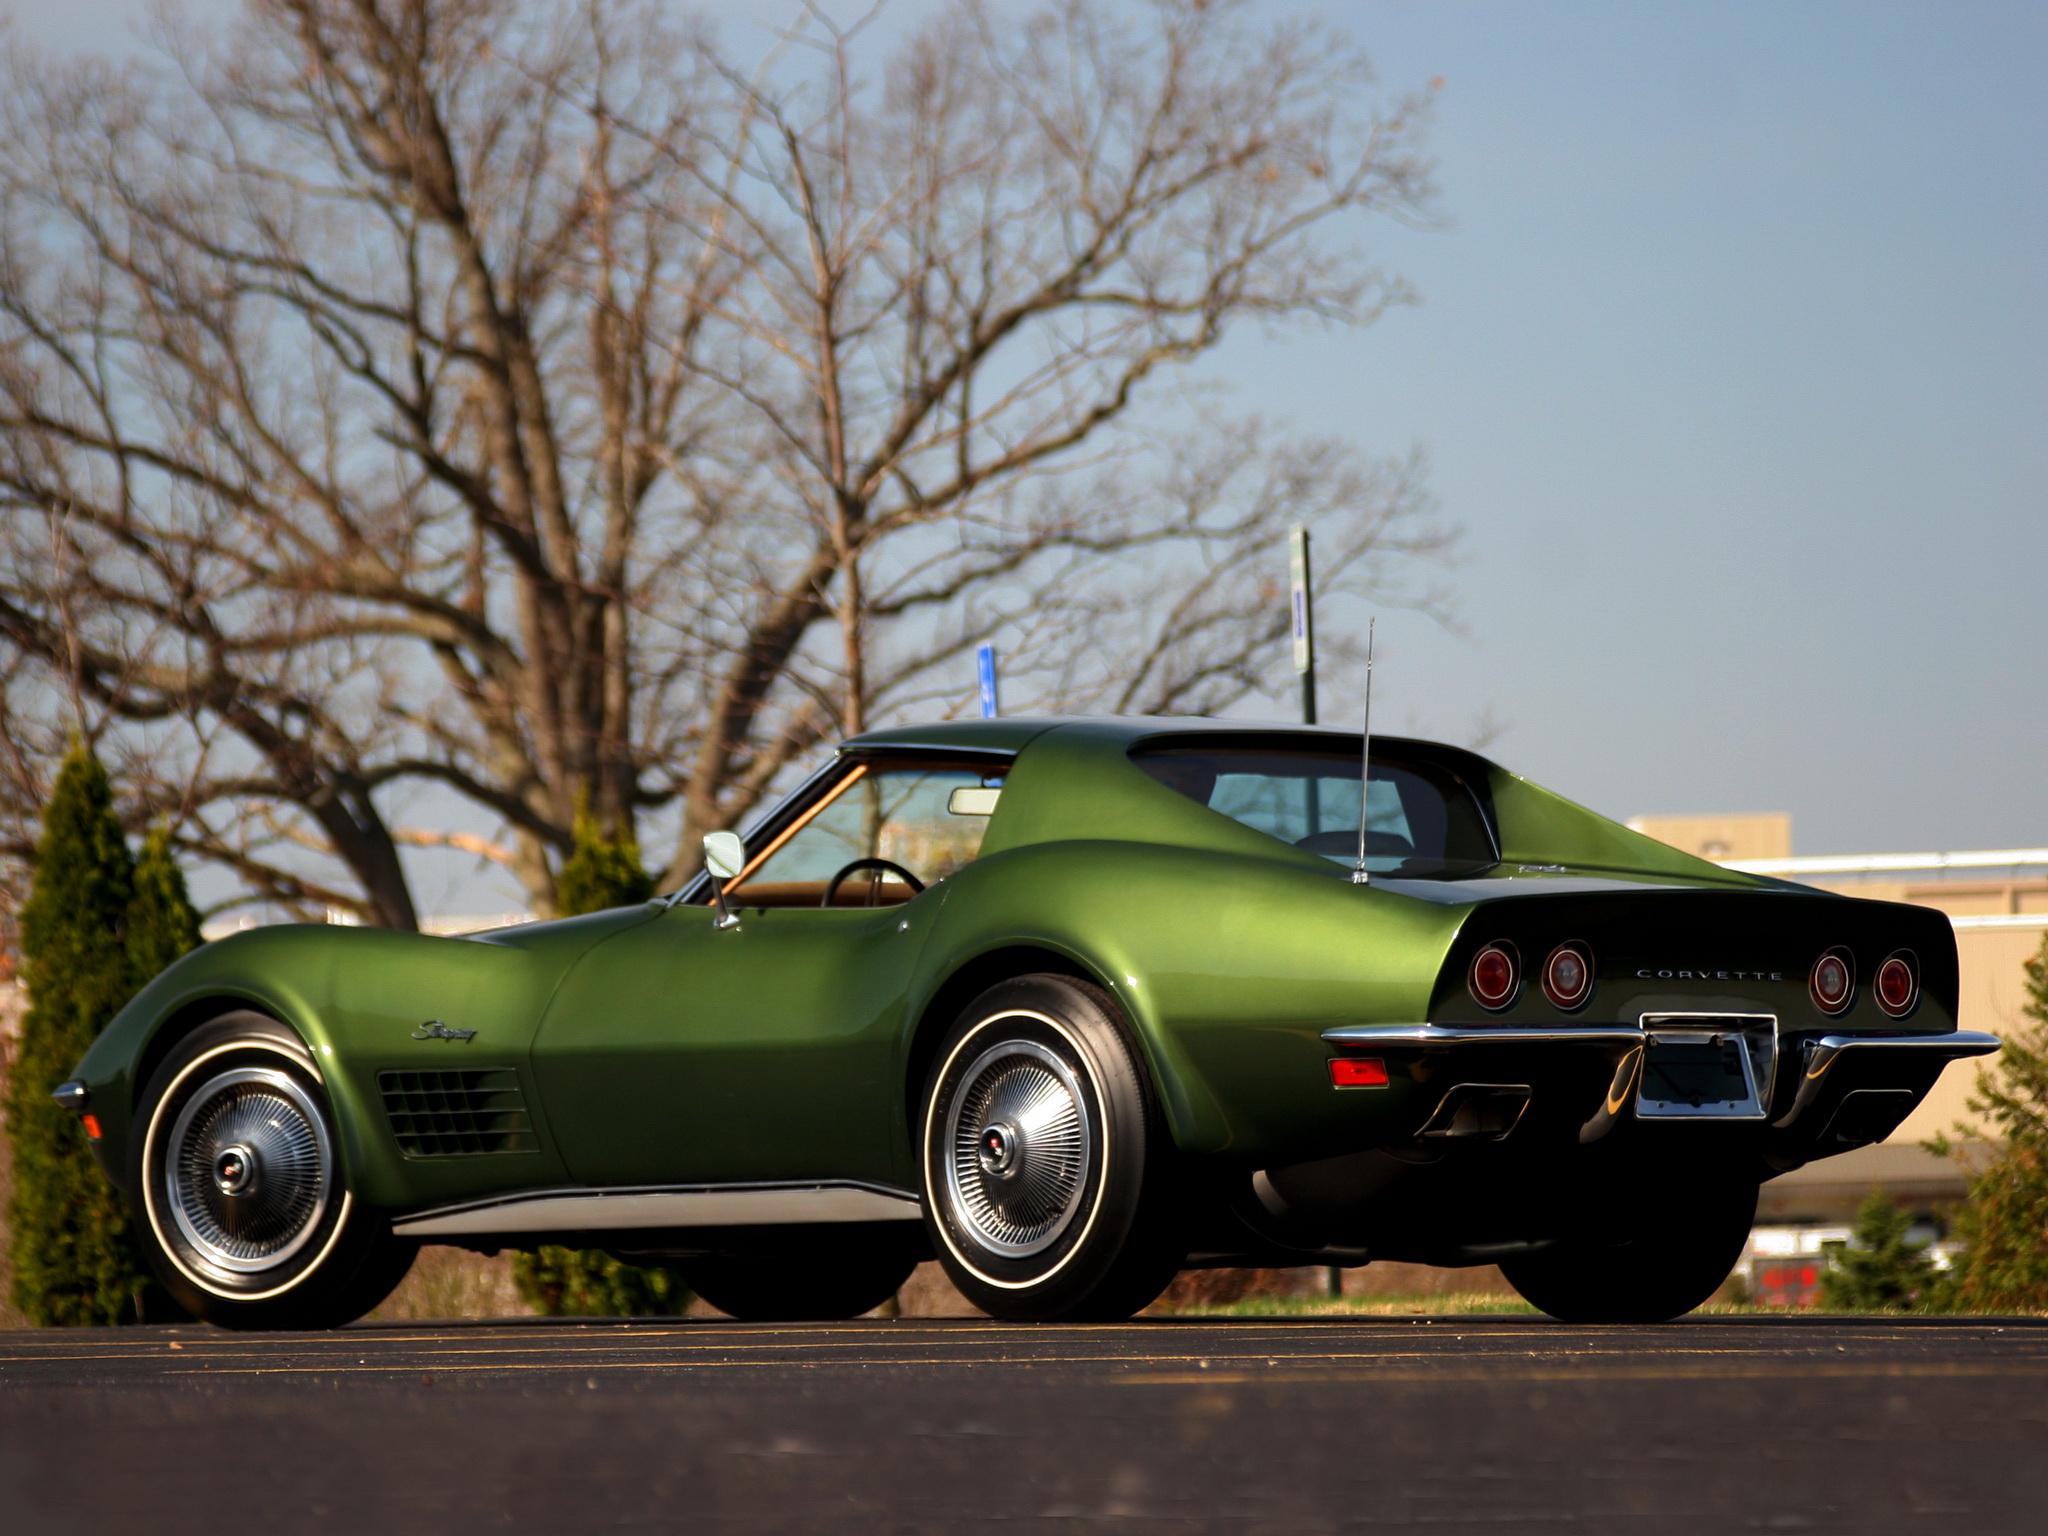 1970 chevrolet corvette stingray 454 c3 supercar muscle classic y wallpaper 2048x1536. Black Bedroom Furniture Sets. Home Design Ideas